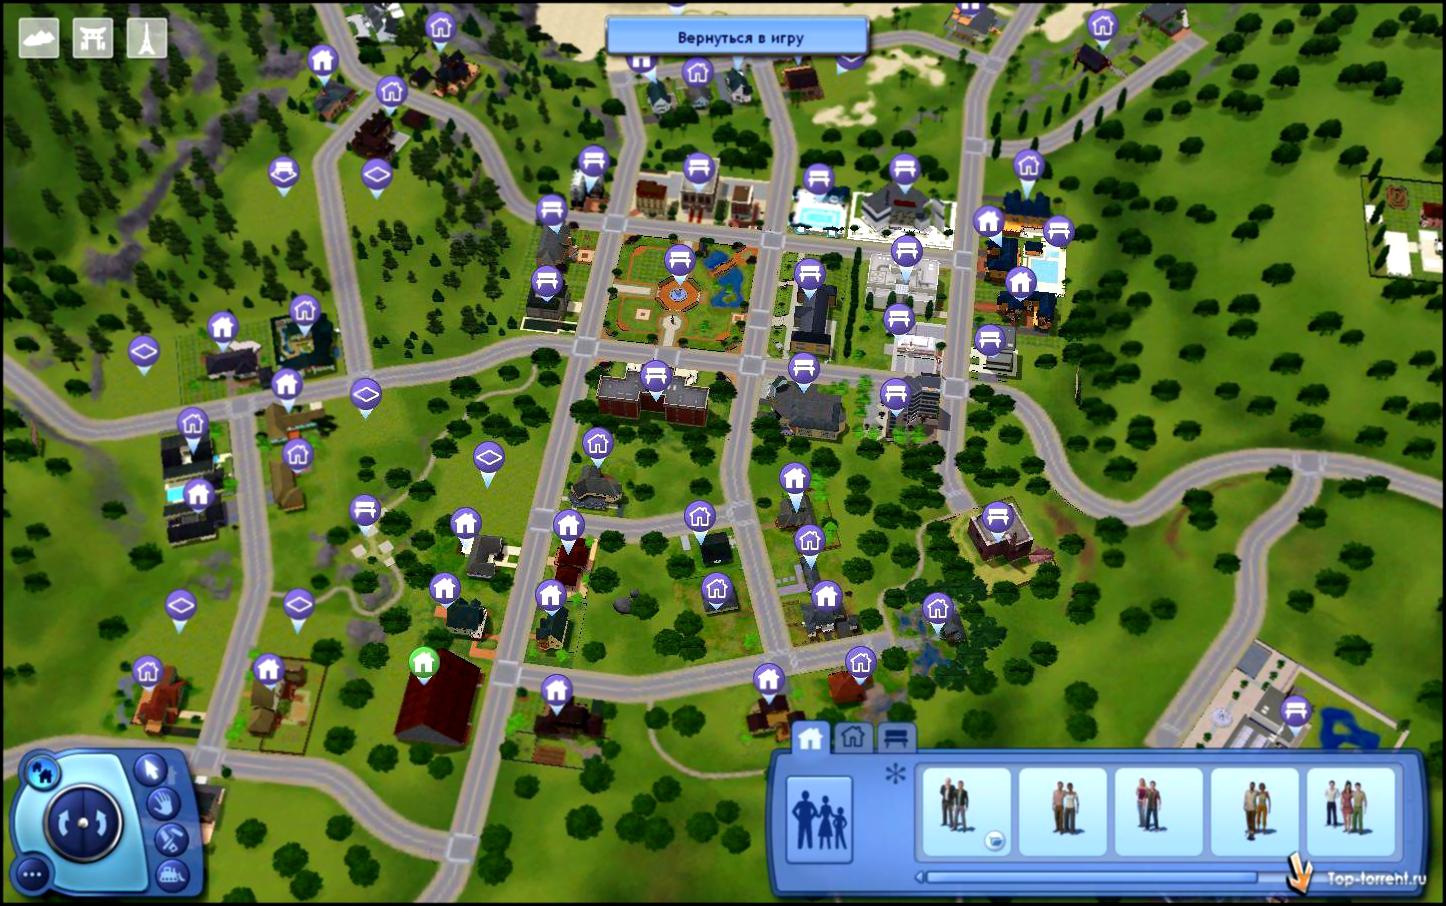 Скачать the sims 3: мир приключений / the sims 3 world adventures.